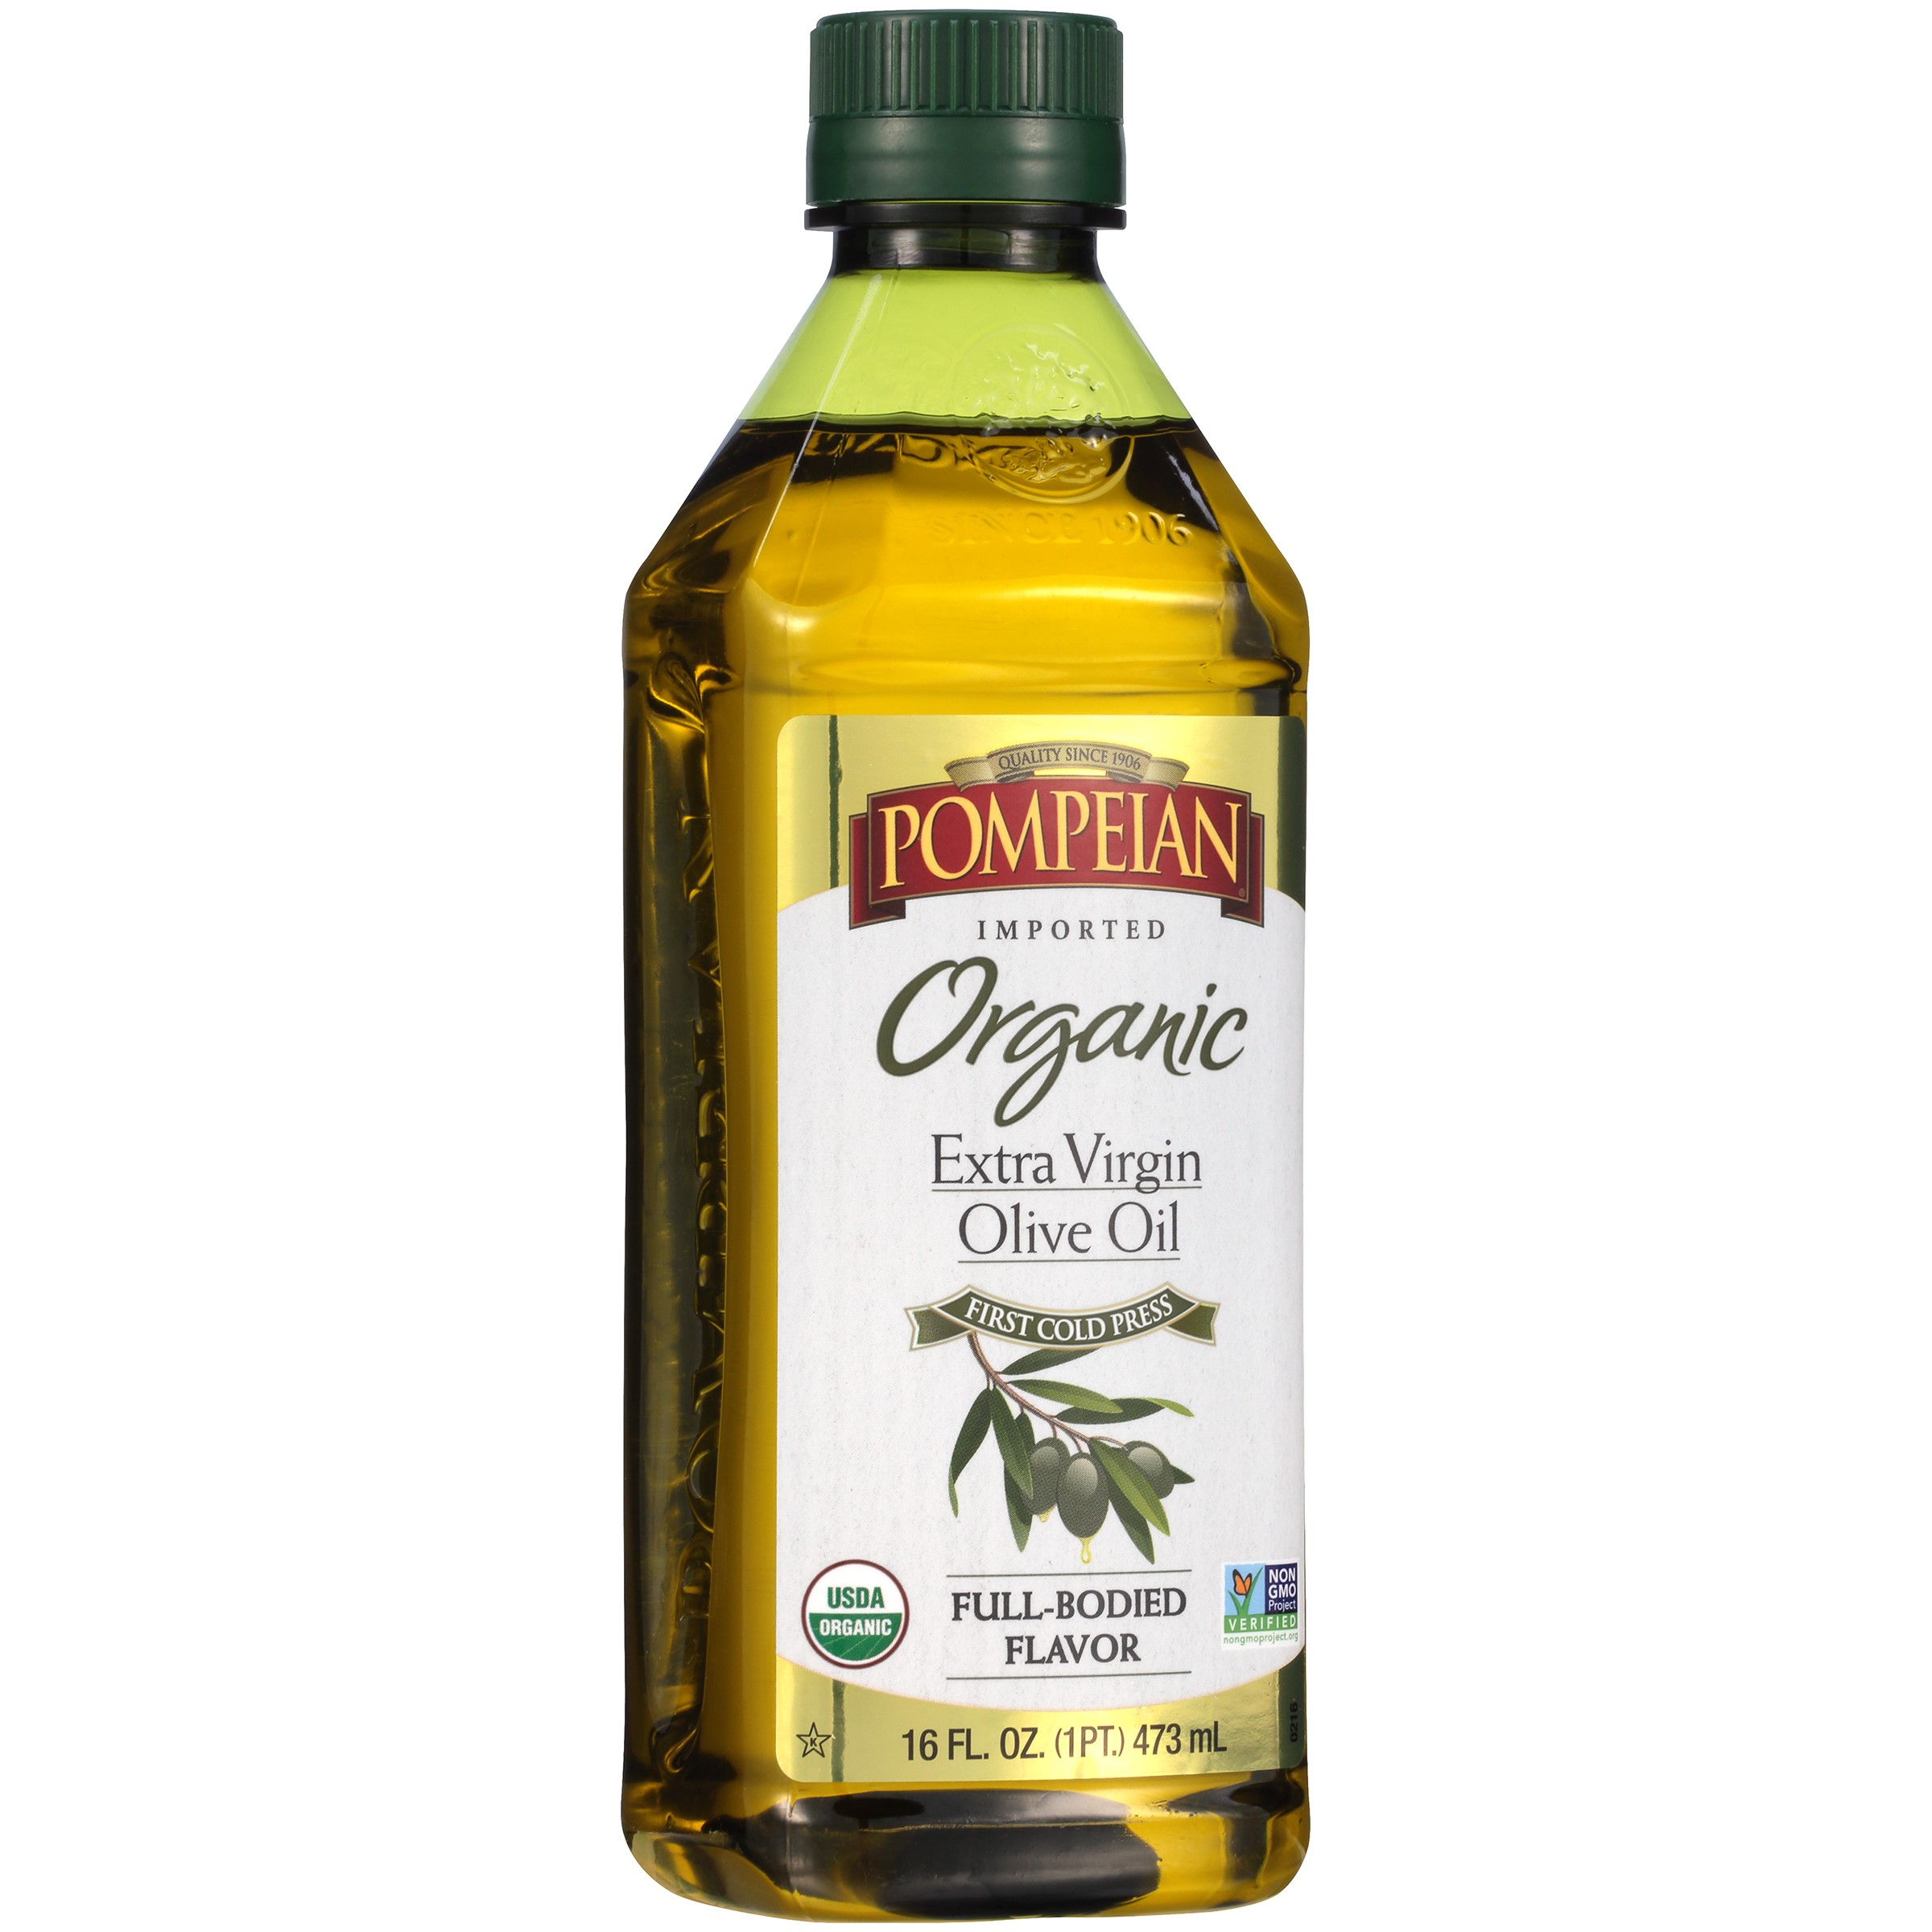 Pompeian Organic Extra Virgin Olive Oil, 16 Oz